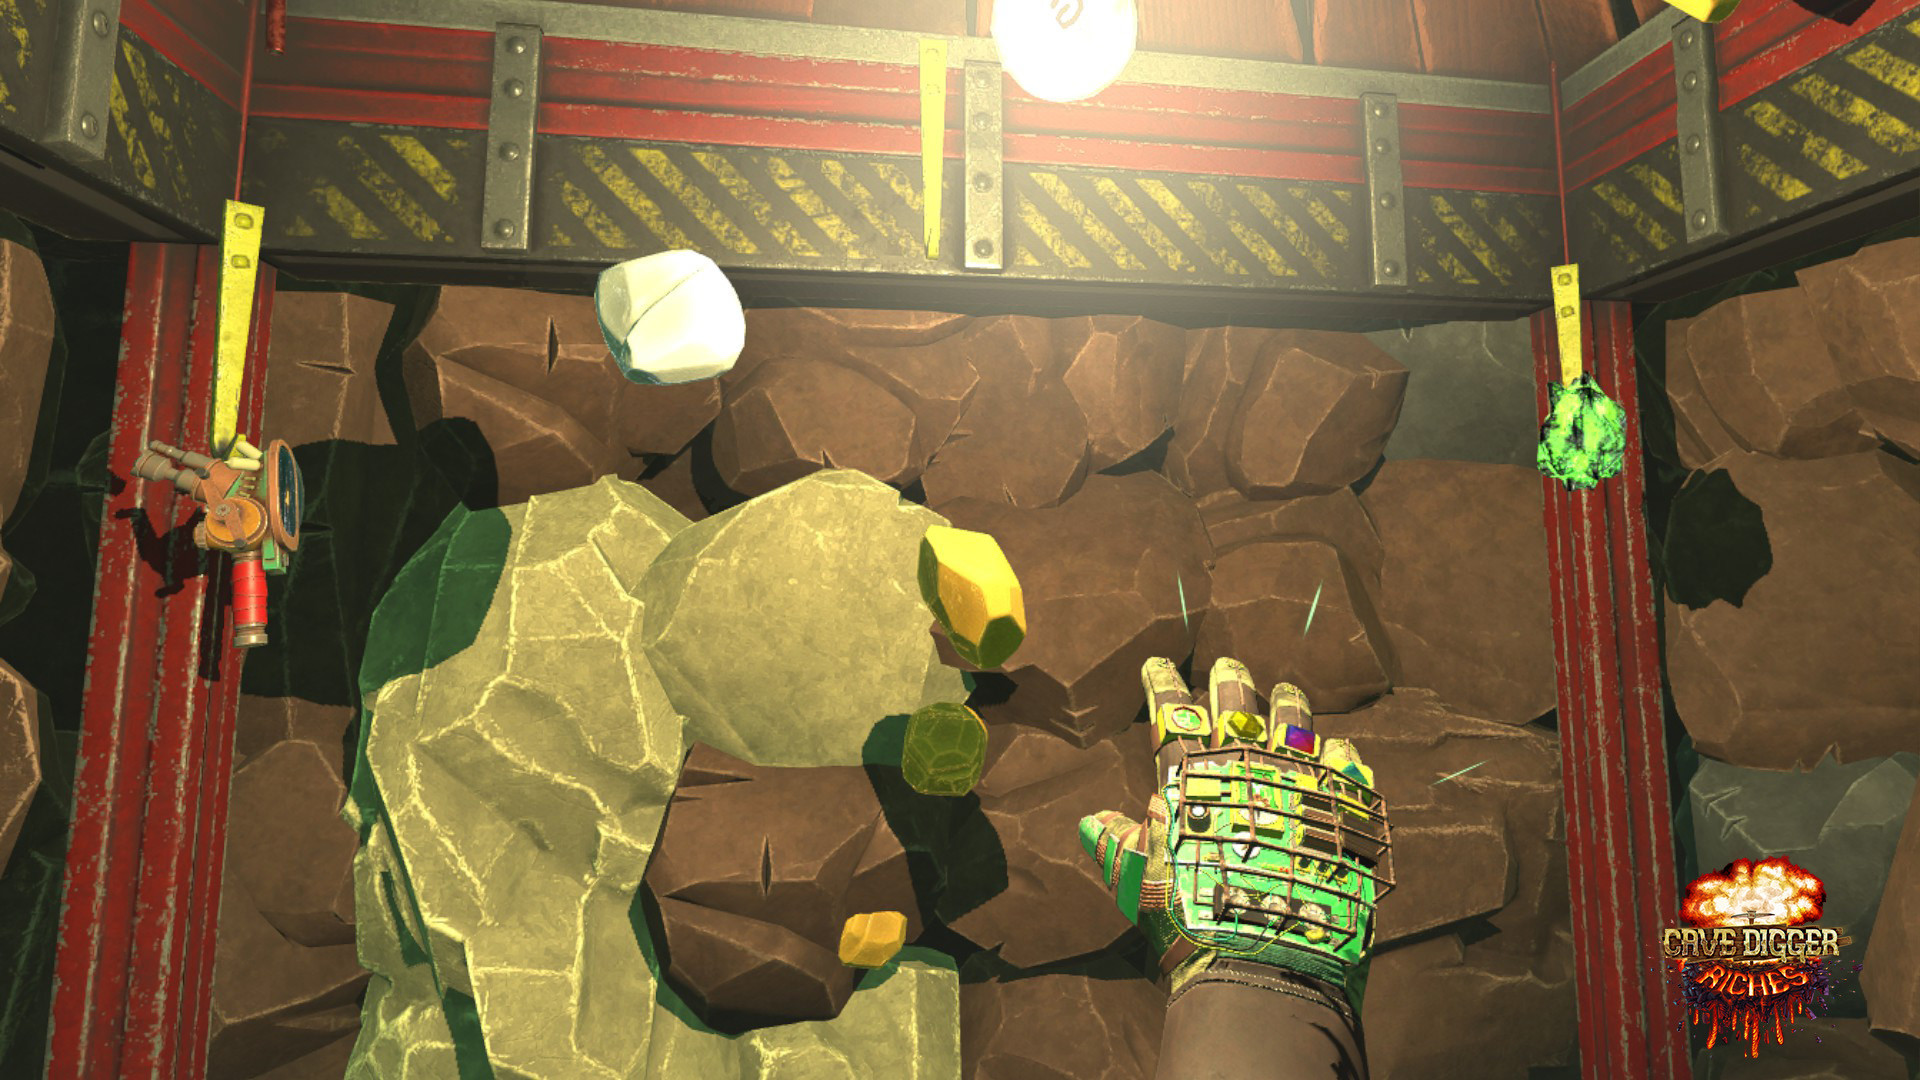 Oculus Quest 游戏《Cave Digger: Riches》地下挖矿者插图(3)